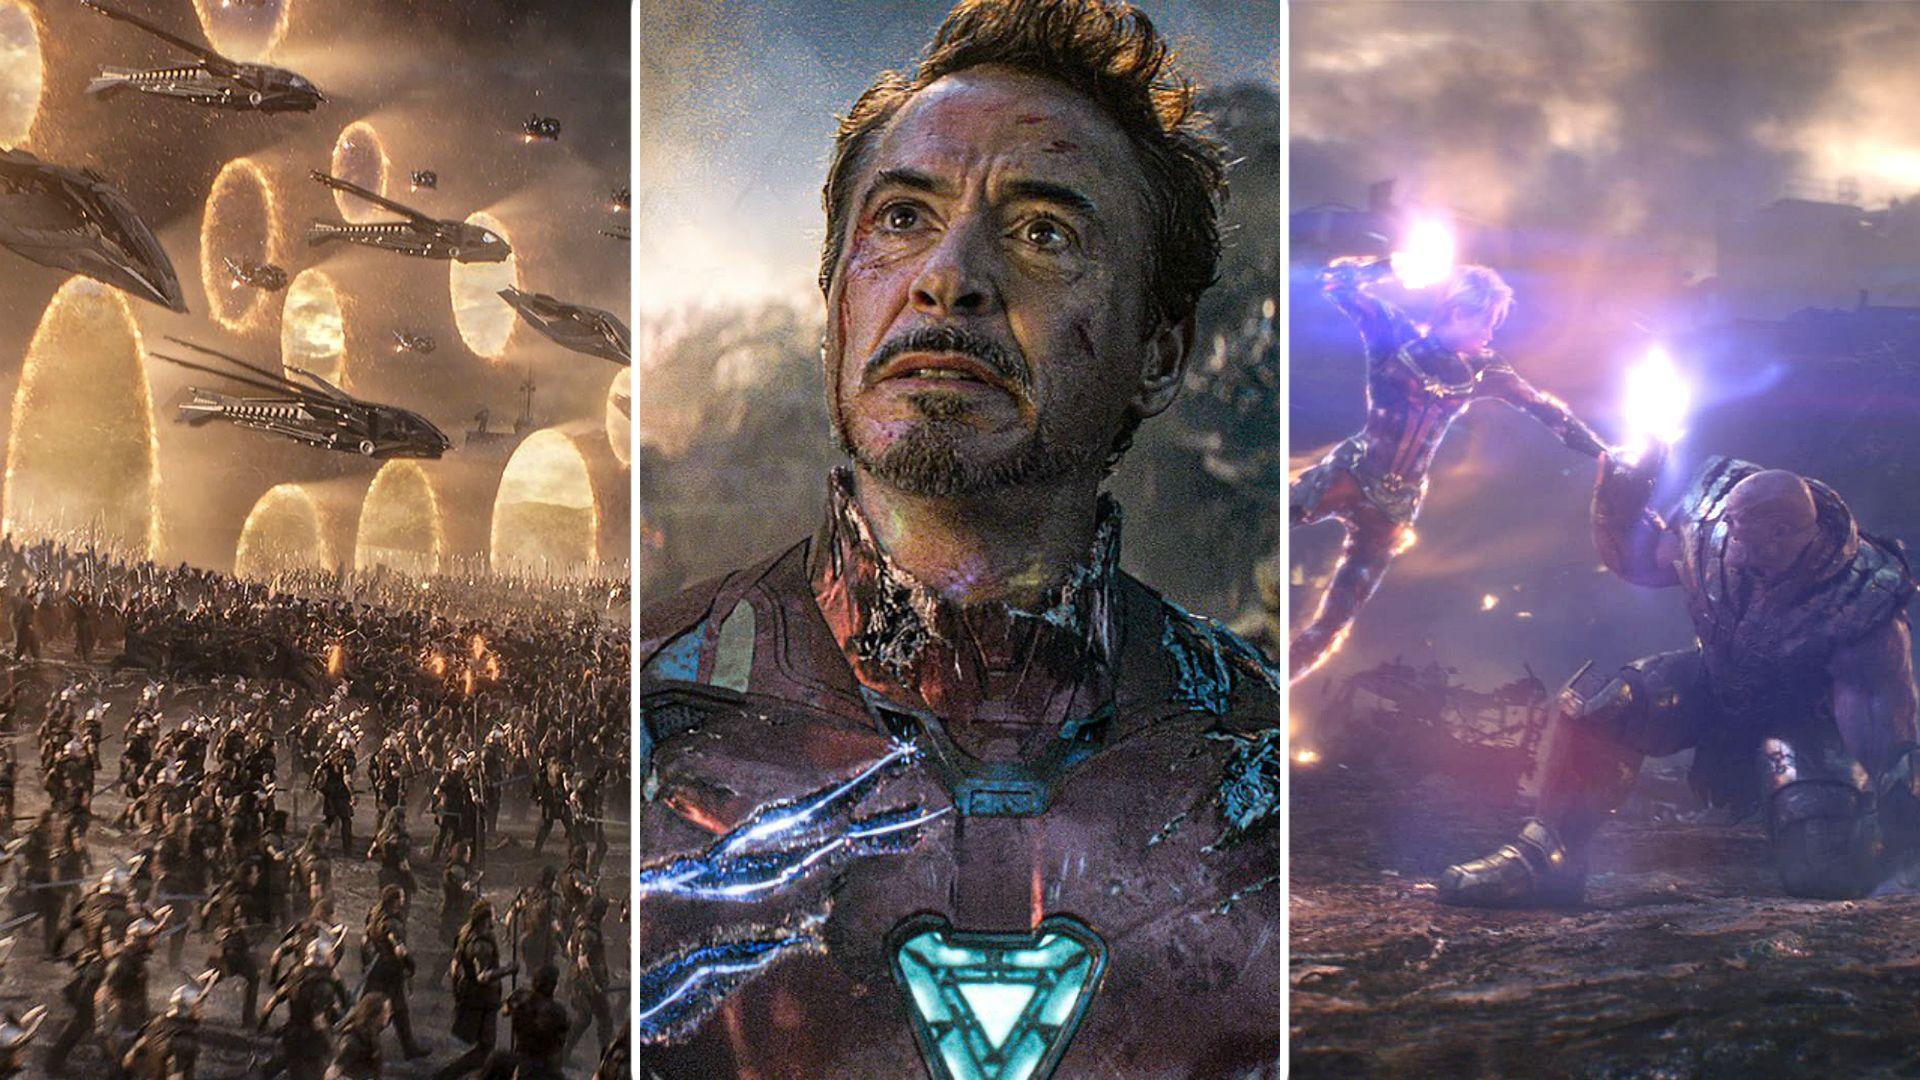 was endgame the last avengers